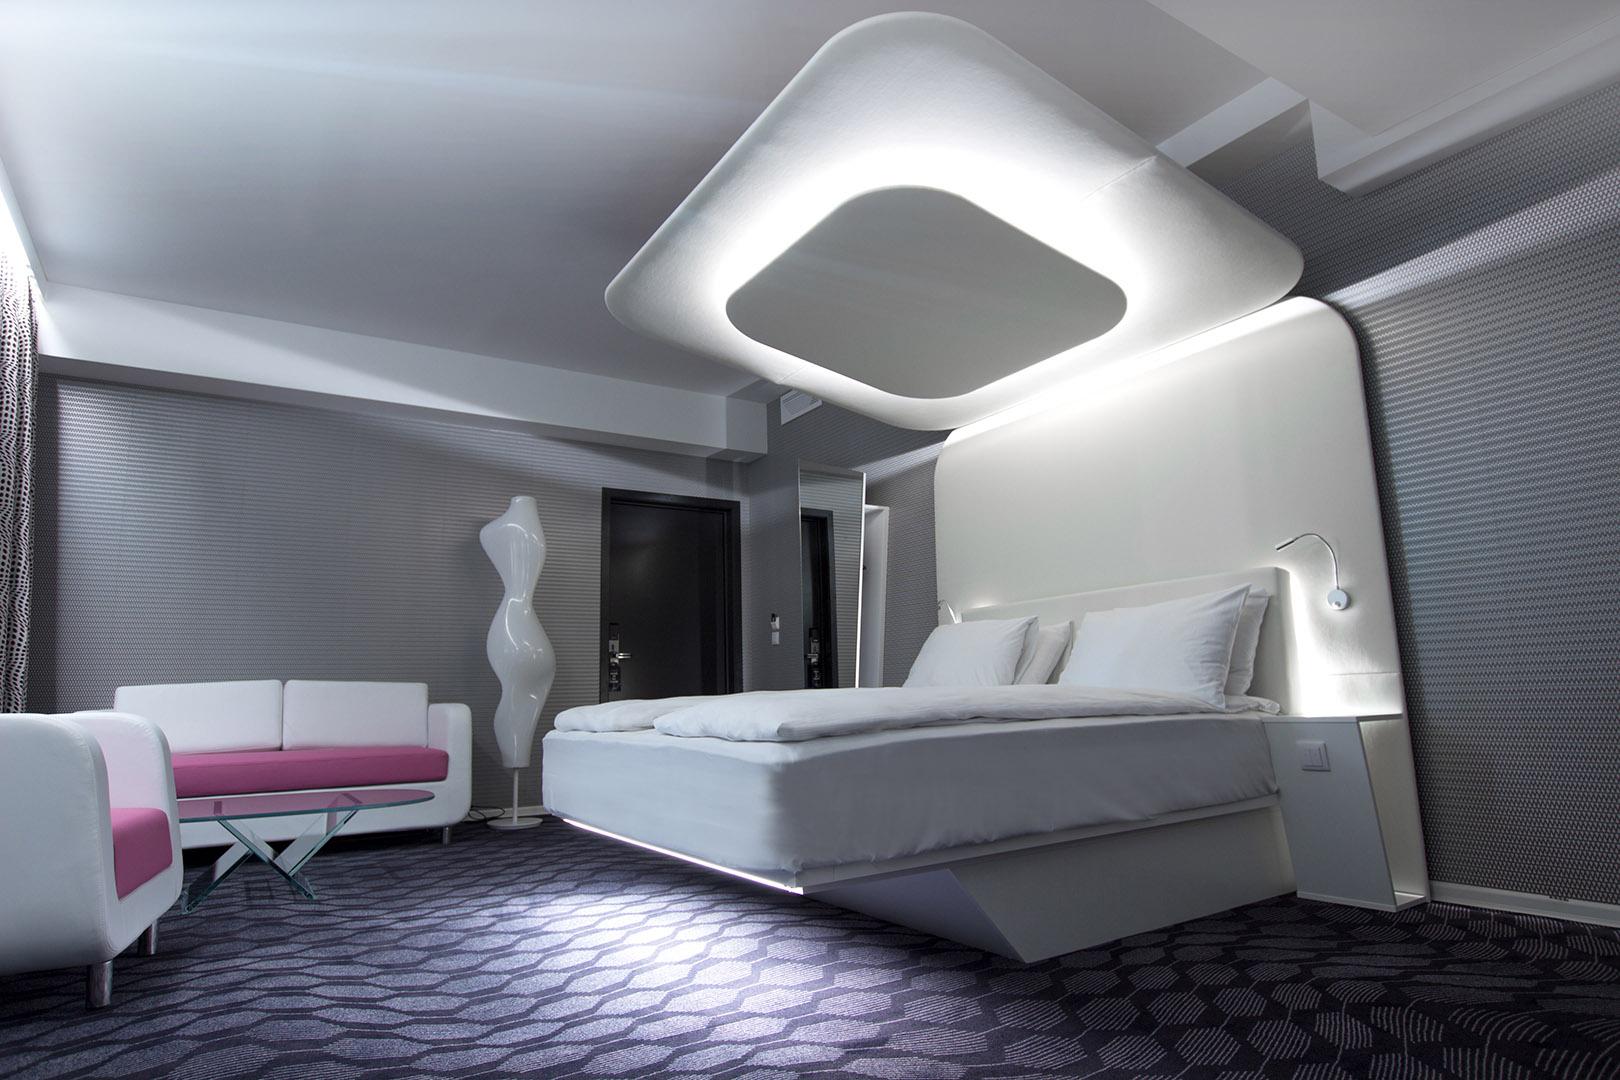 MagicHotel Room